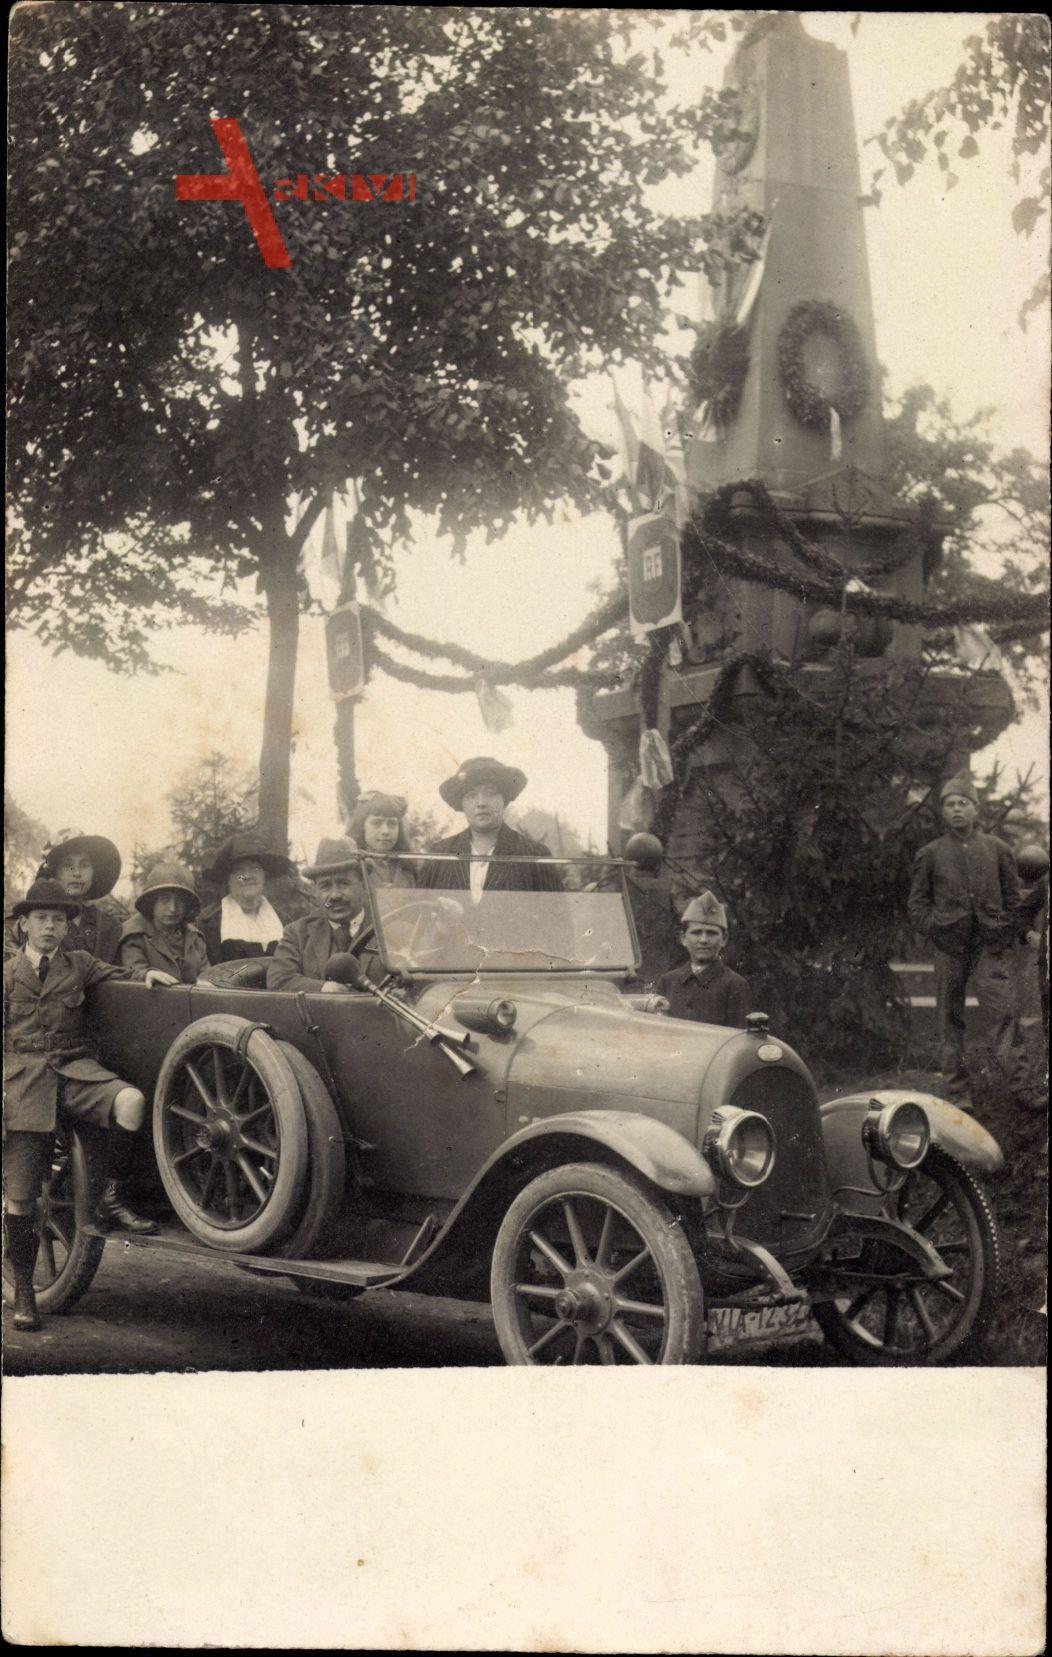 Frankreich, Spazierfahrt, Automobil, Kriegerdenkmal, Familienfoto